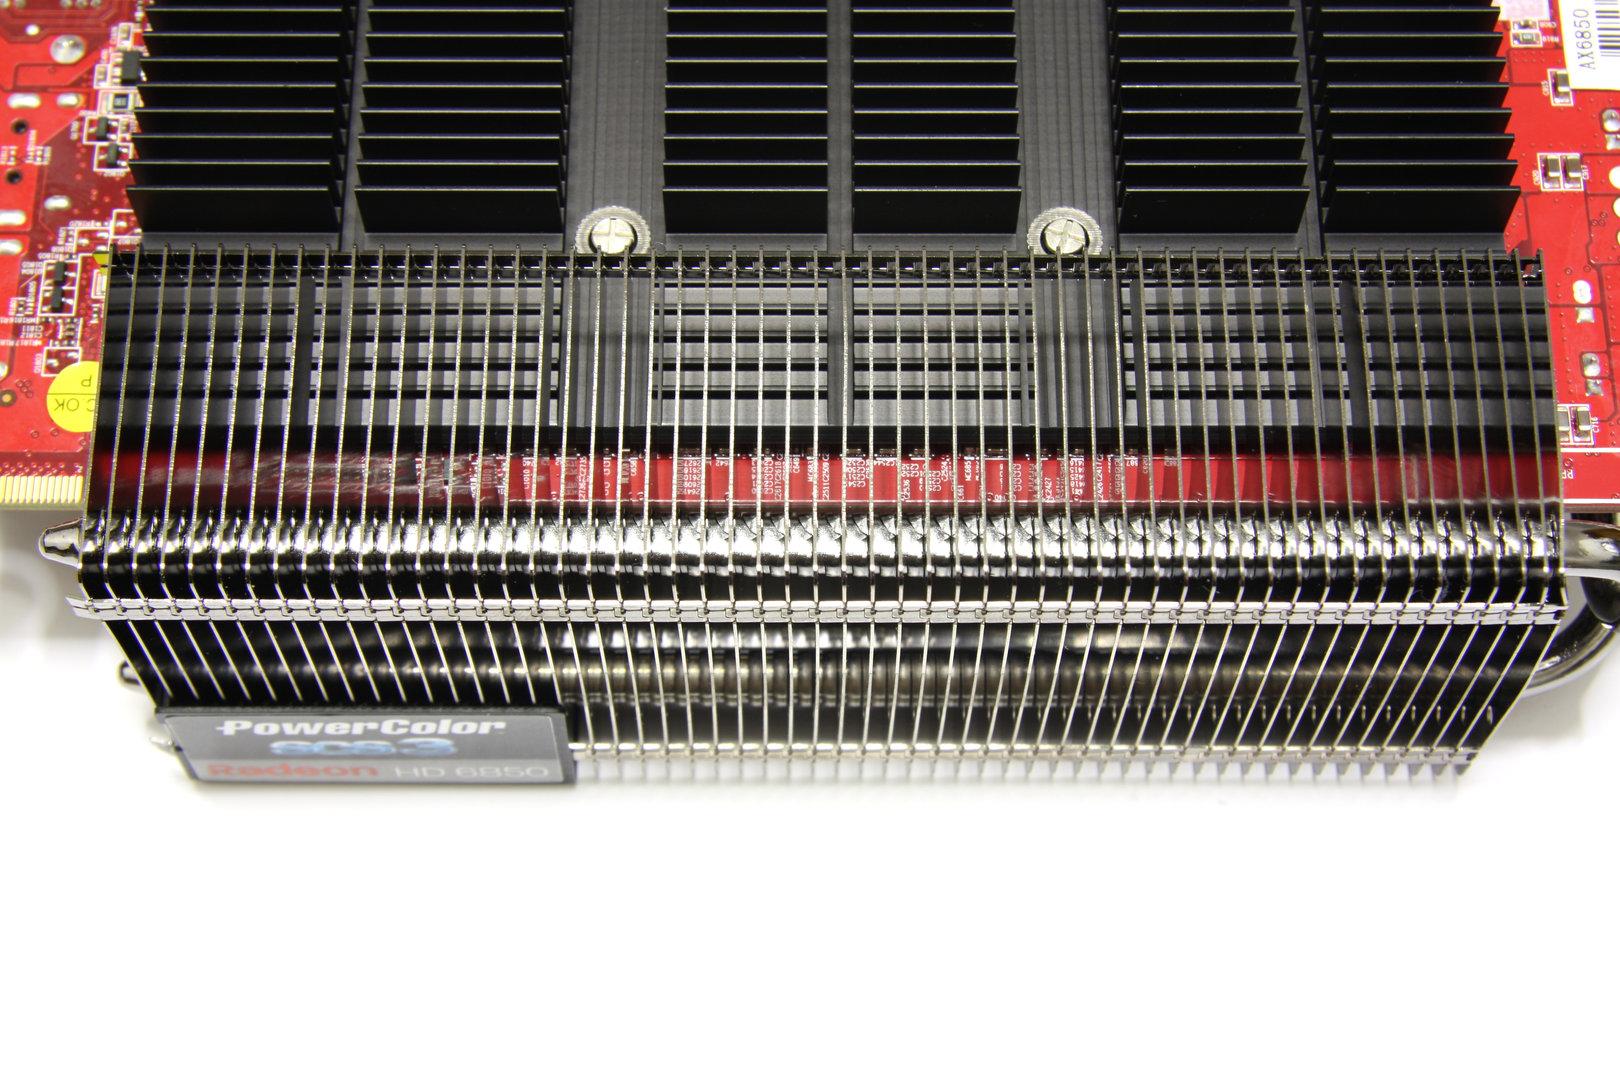 Radeon HD 6850 SCS3 Kühlkörper